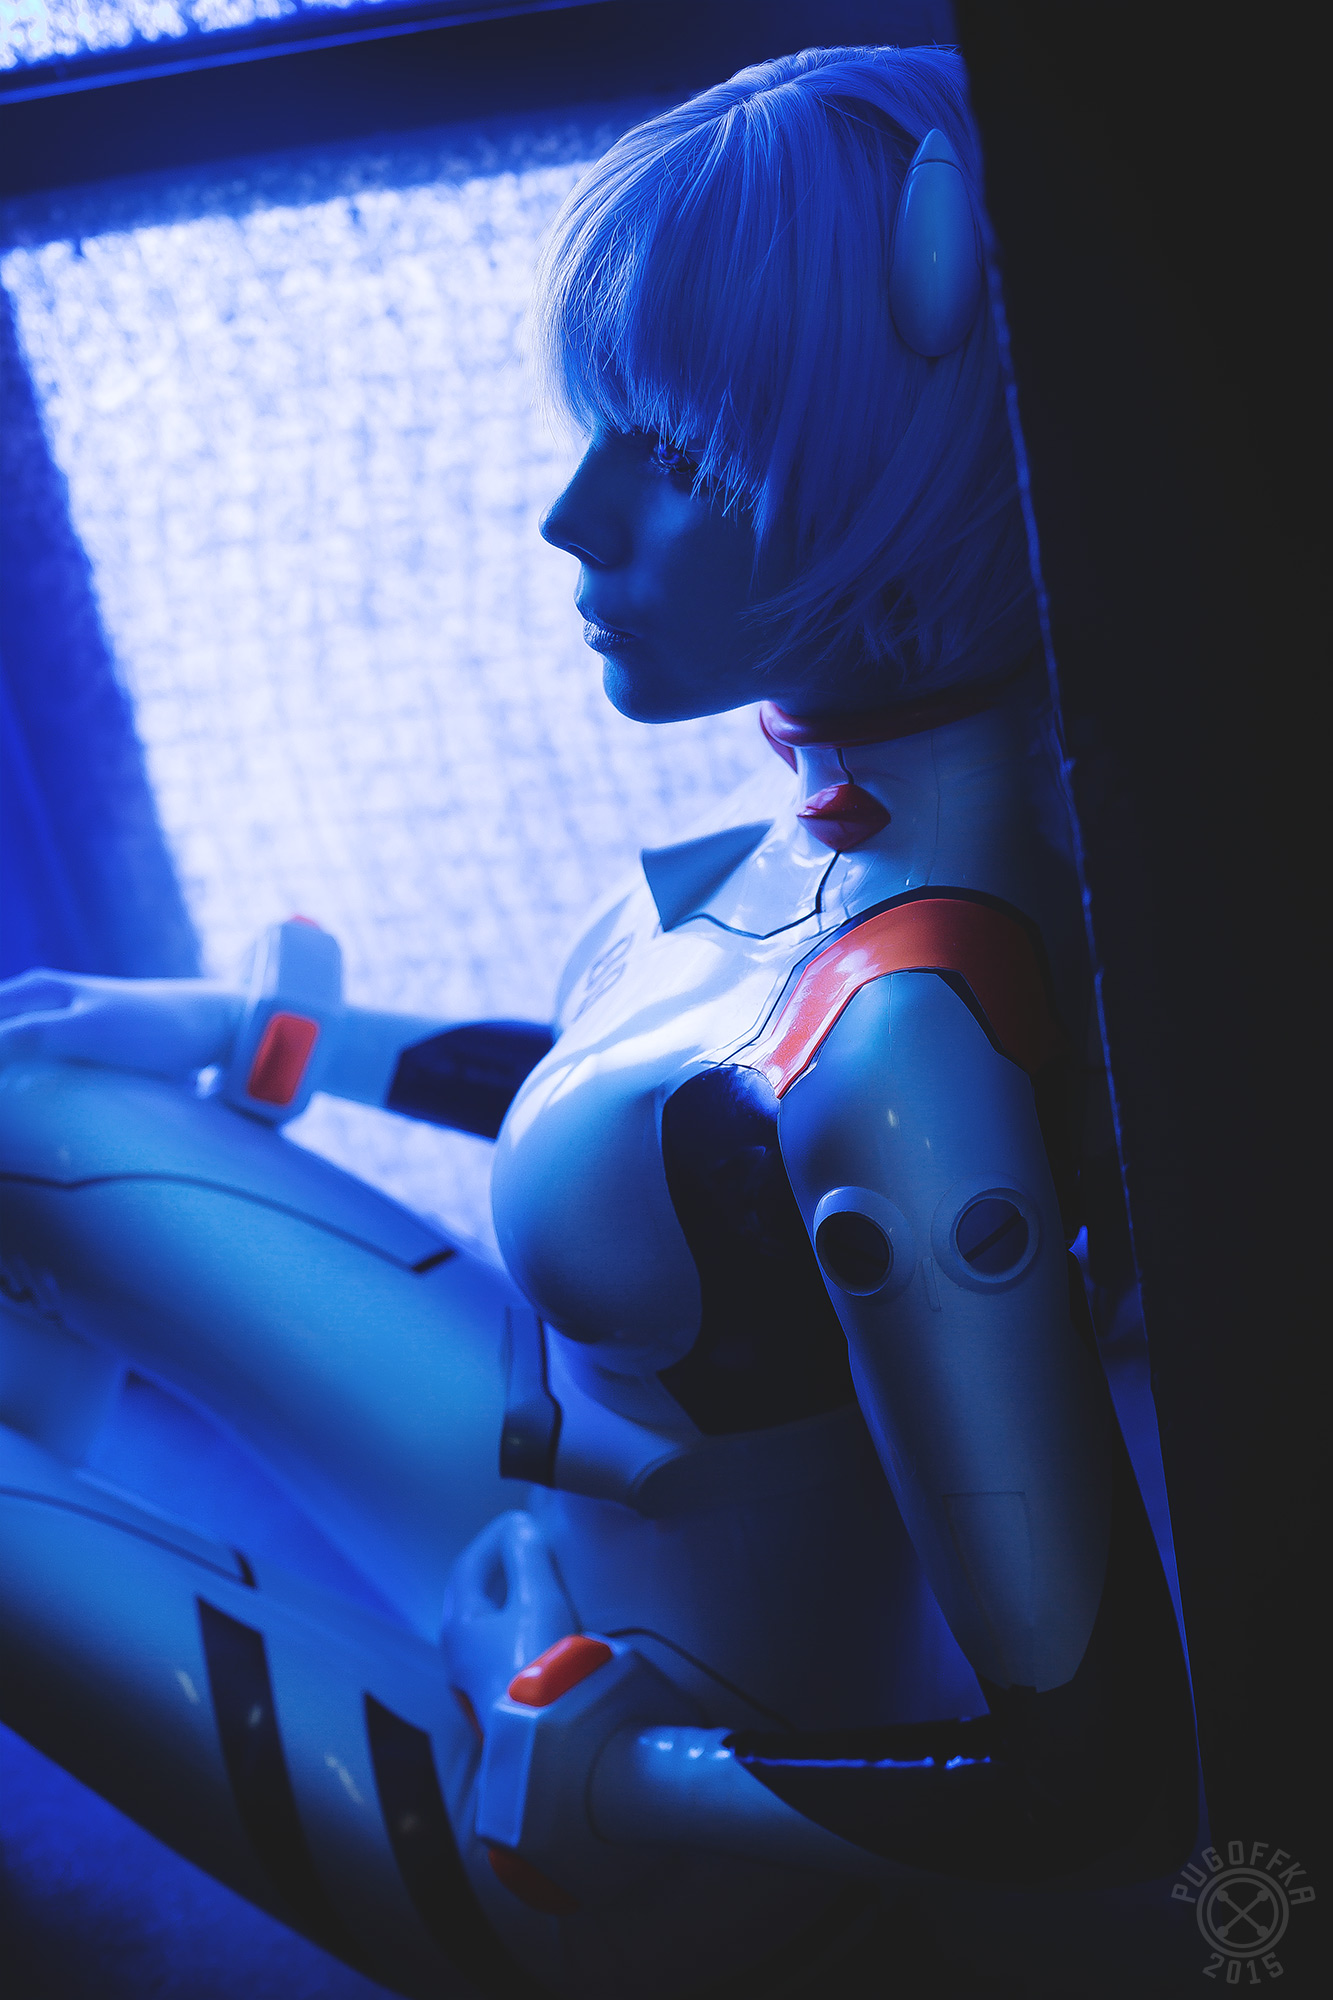 Rei ayanami   neon genesis evangelion By frosel d8qoc6z